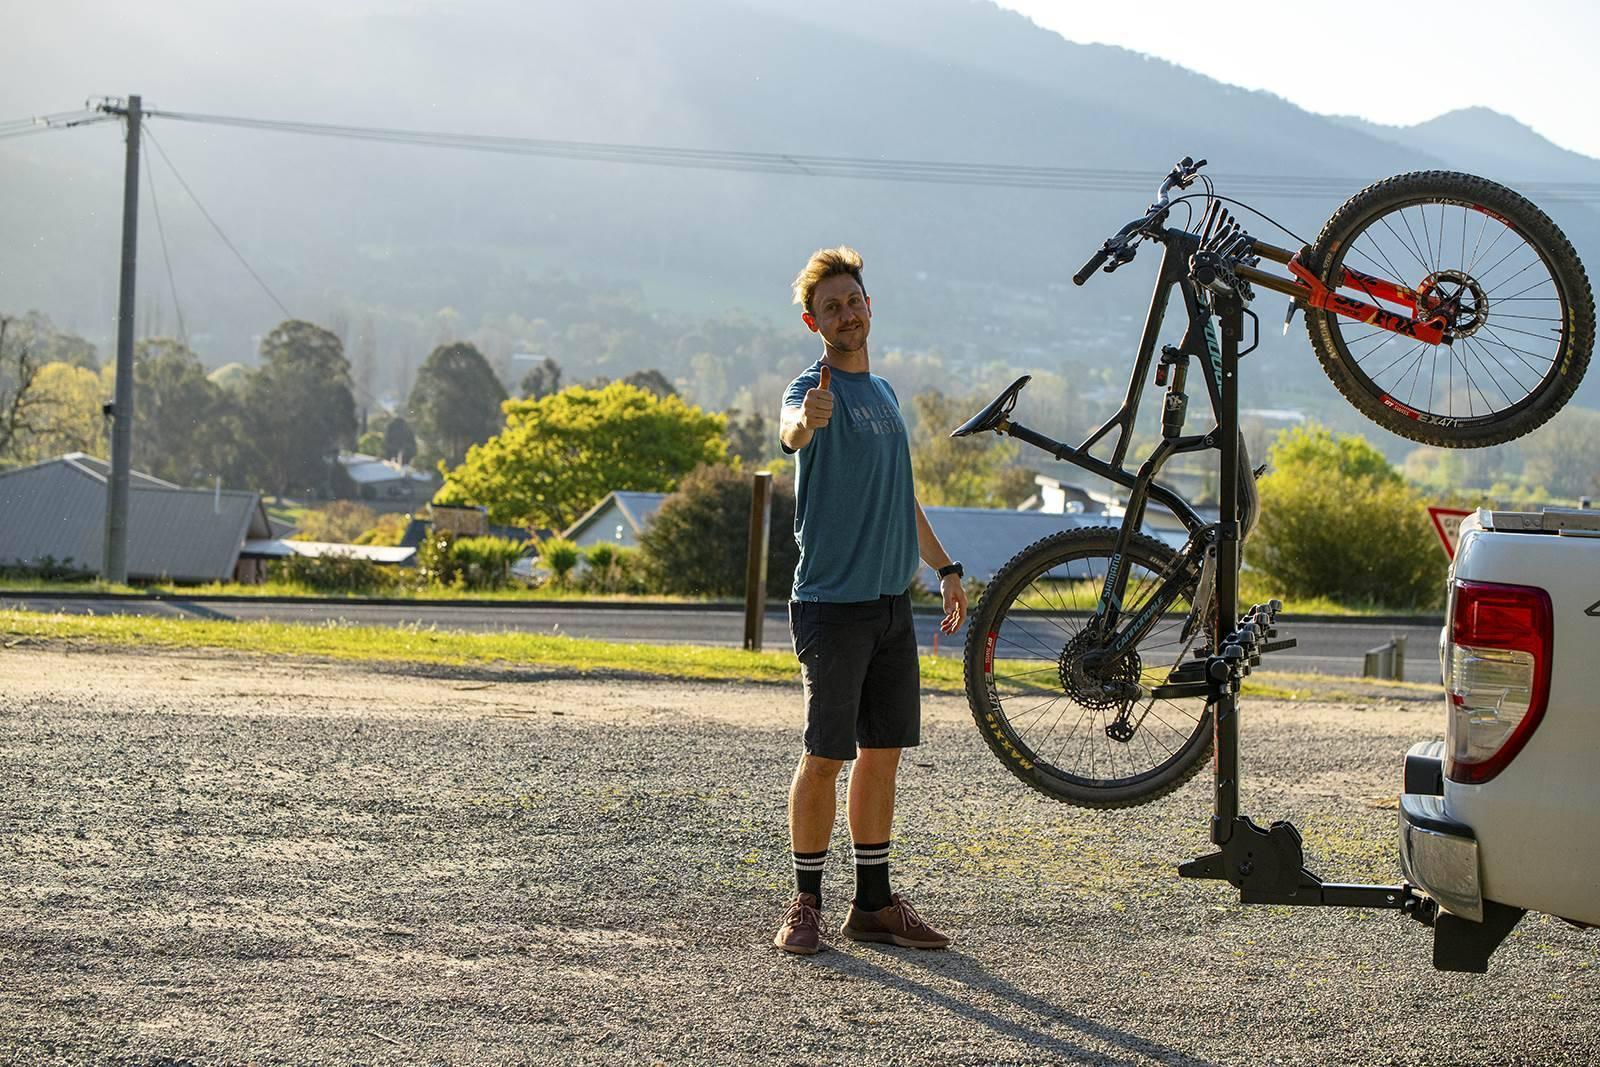 TESTED: Yakima HangOver 6 bike rack